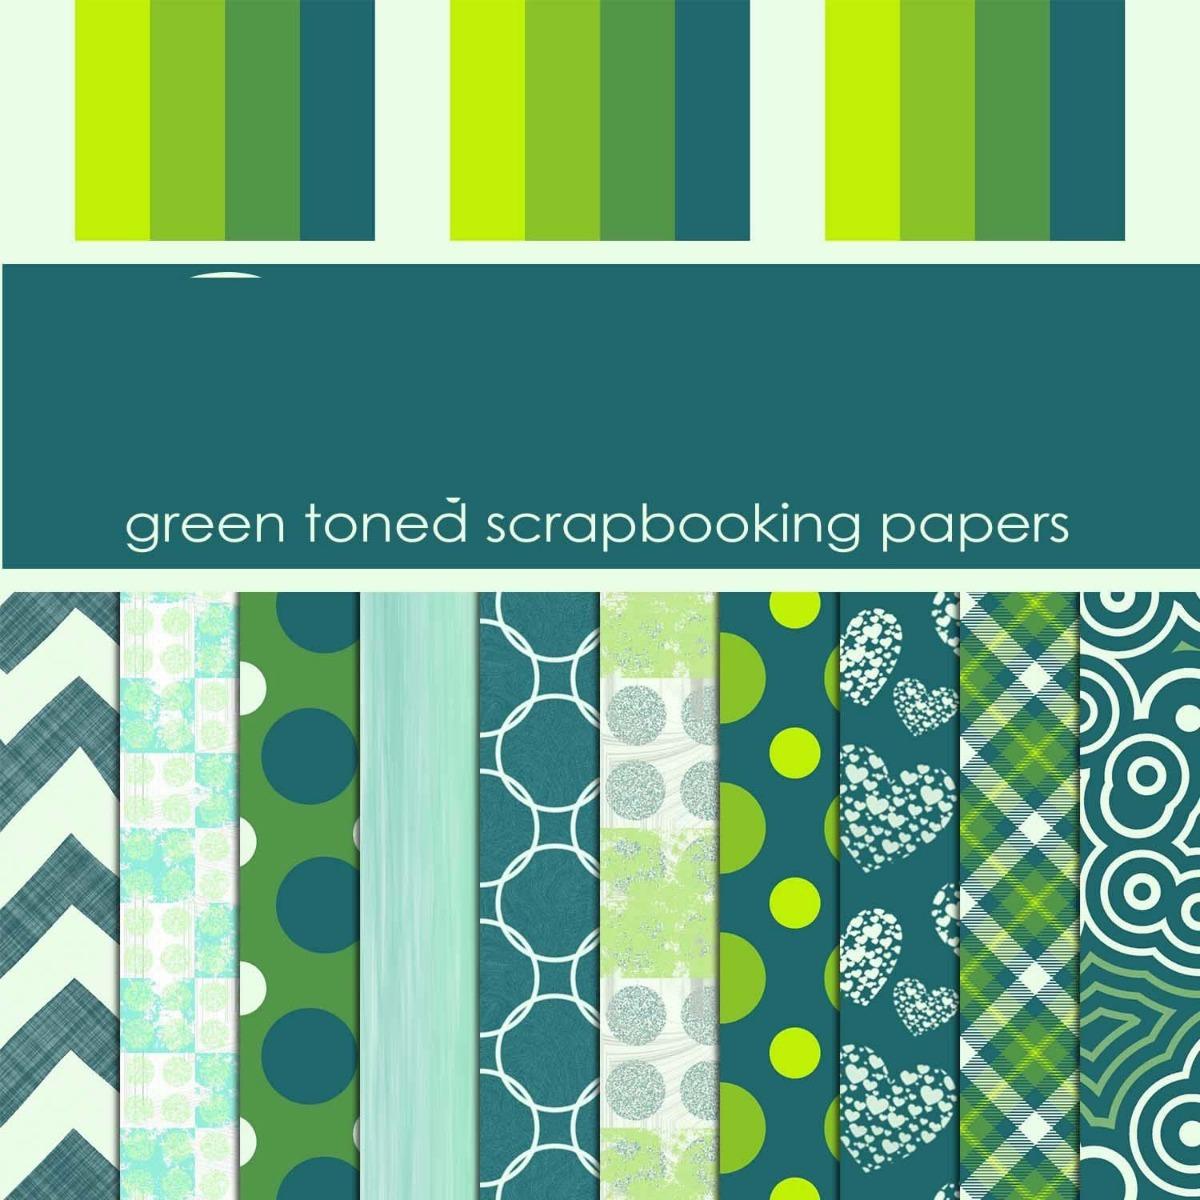 Kit Imprimible Pack Fondos Tonos Verde Blanco Azul 6 Imagene 35 - Tonos-verde